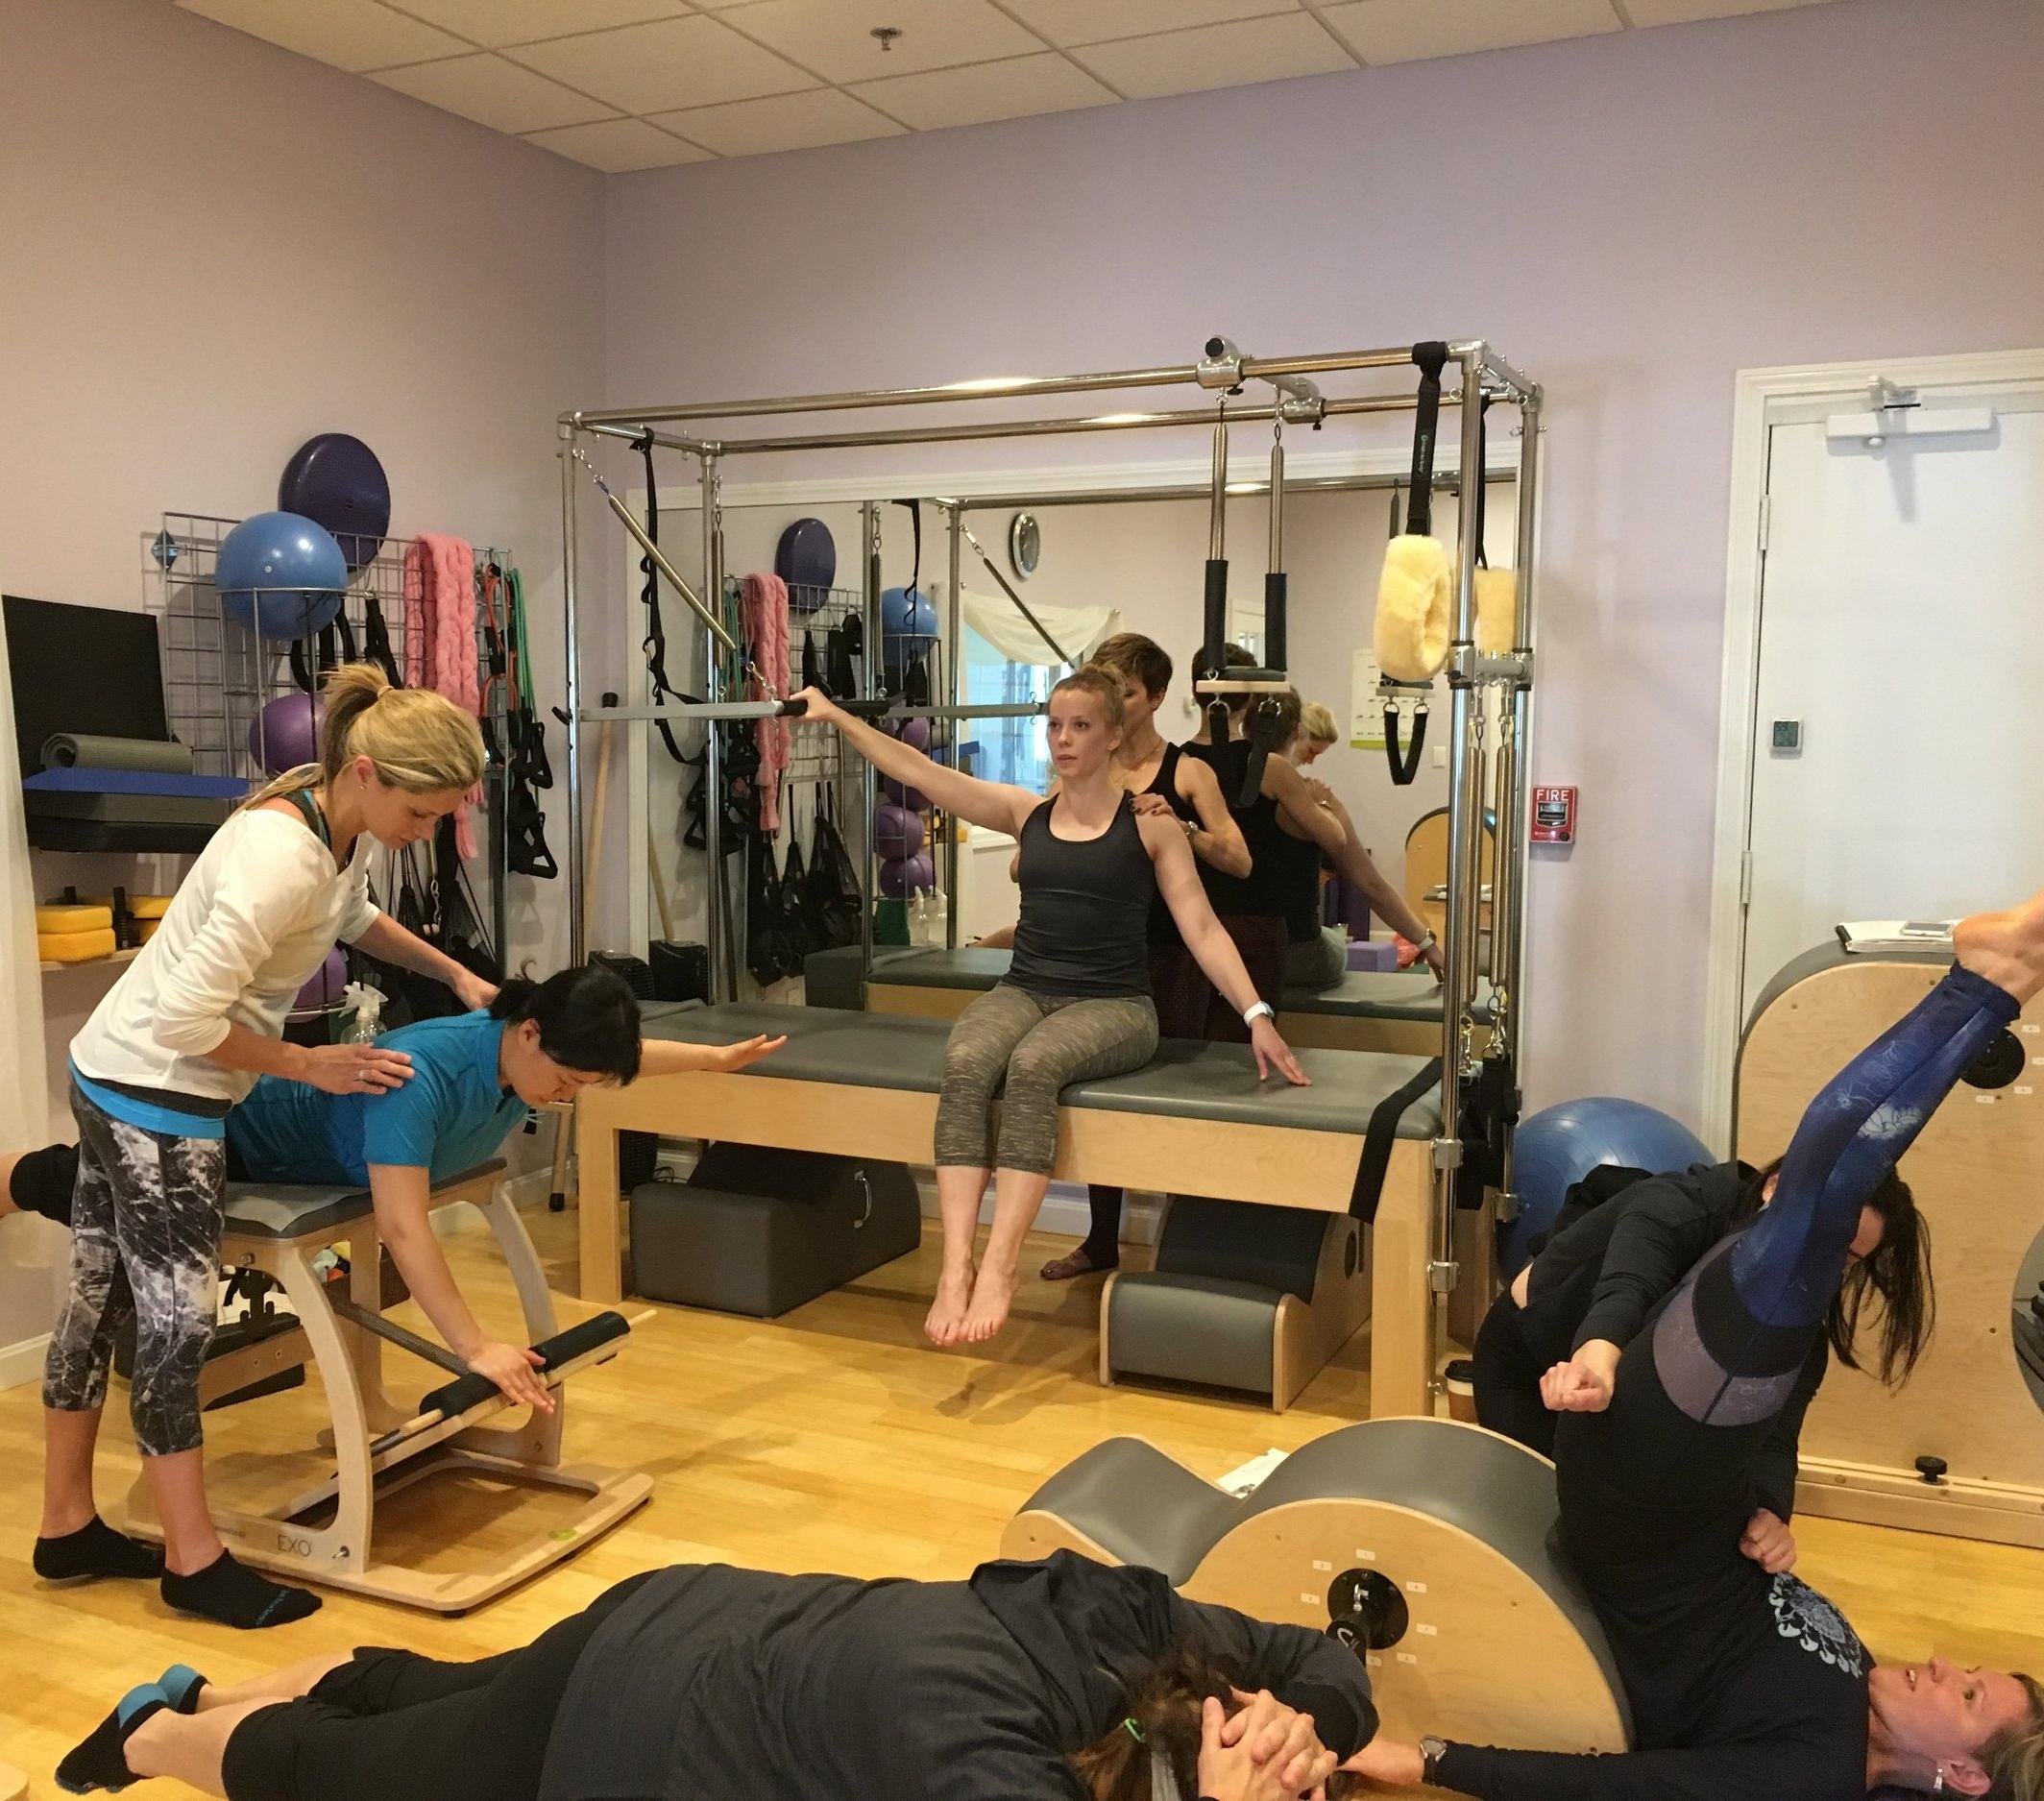 Healthy-Changes-Pilates-Expertise-BASI-Pilates-Teacher-Training.JPG